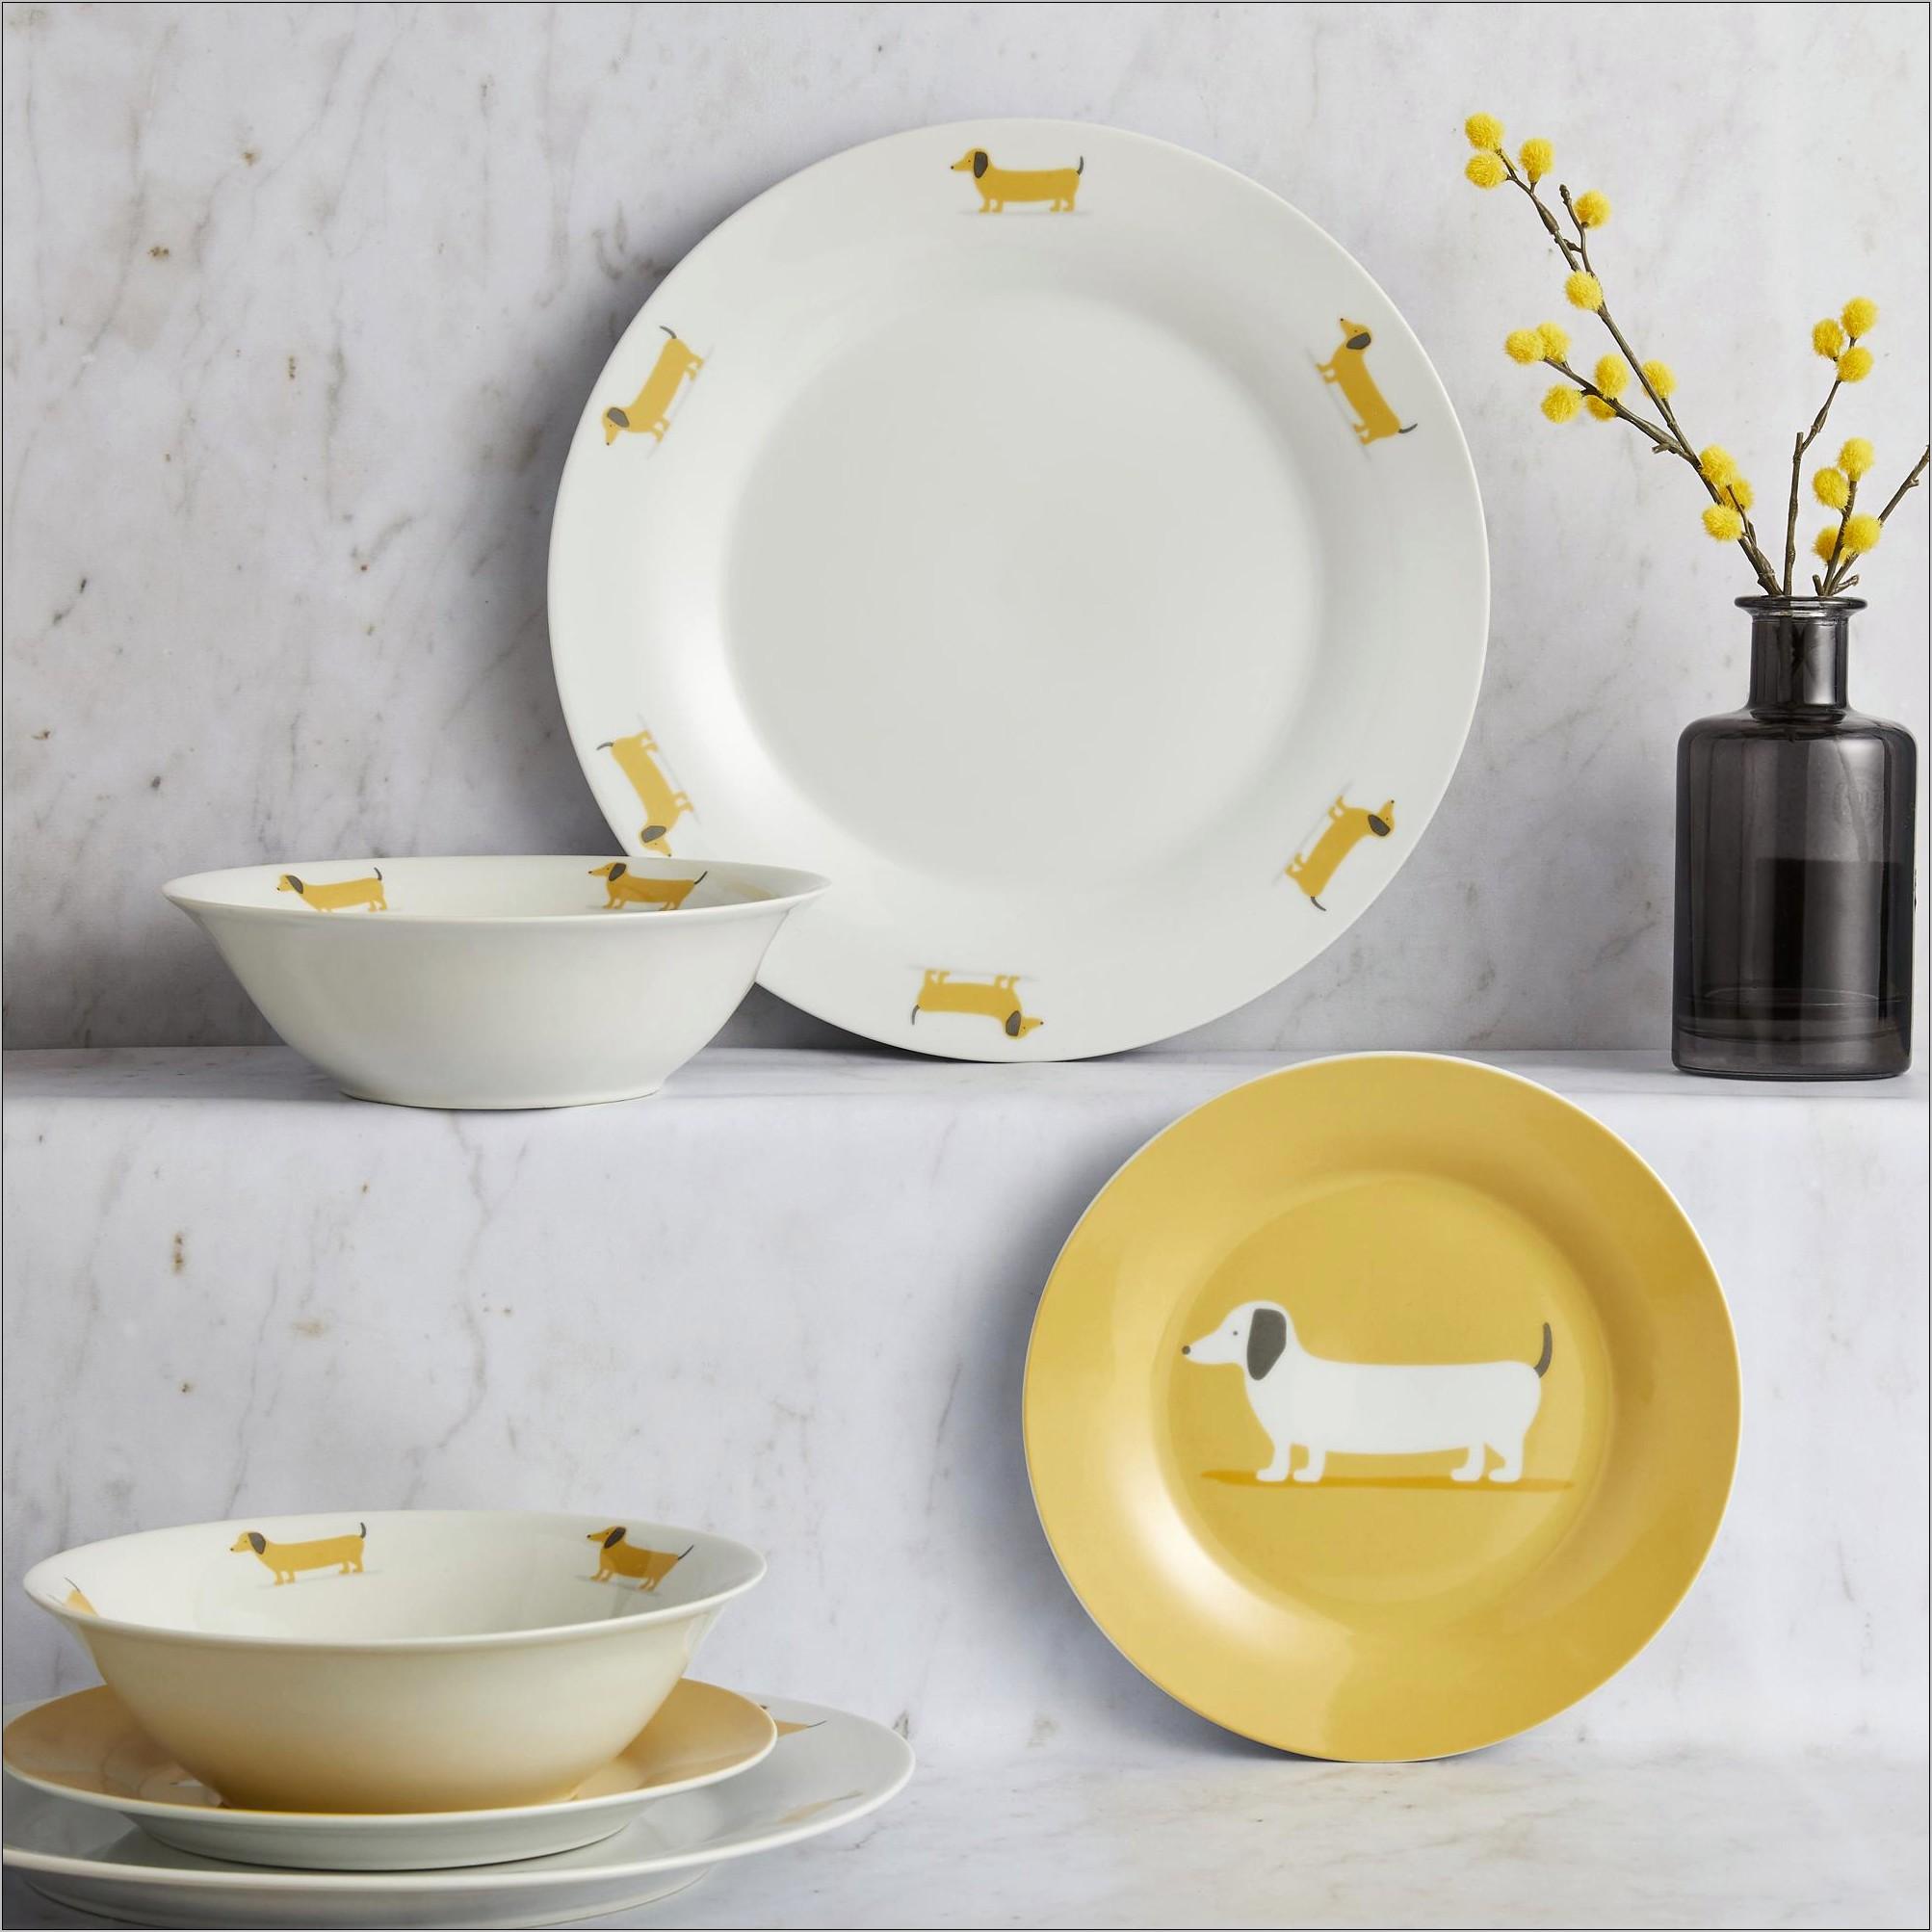 Decorative Ceramic Kitchen Plates